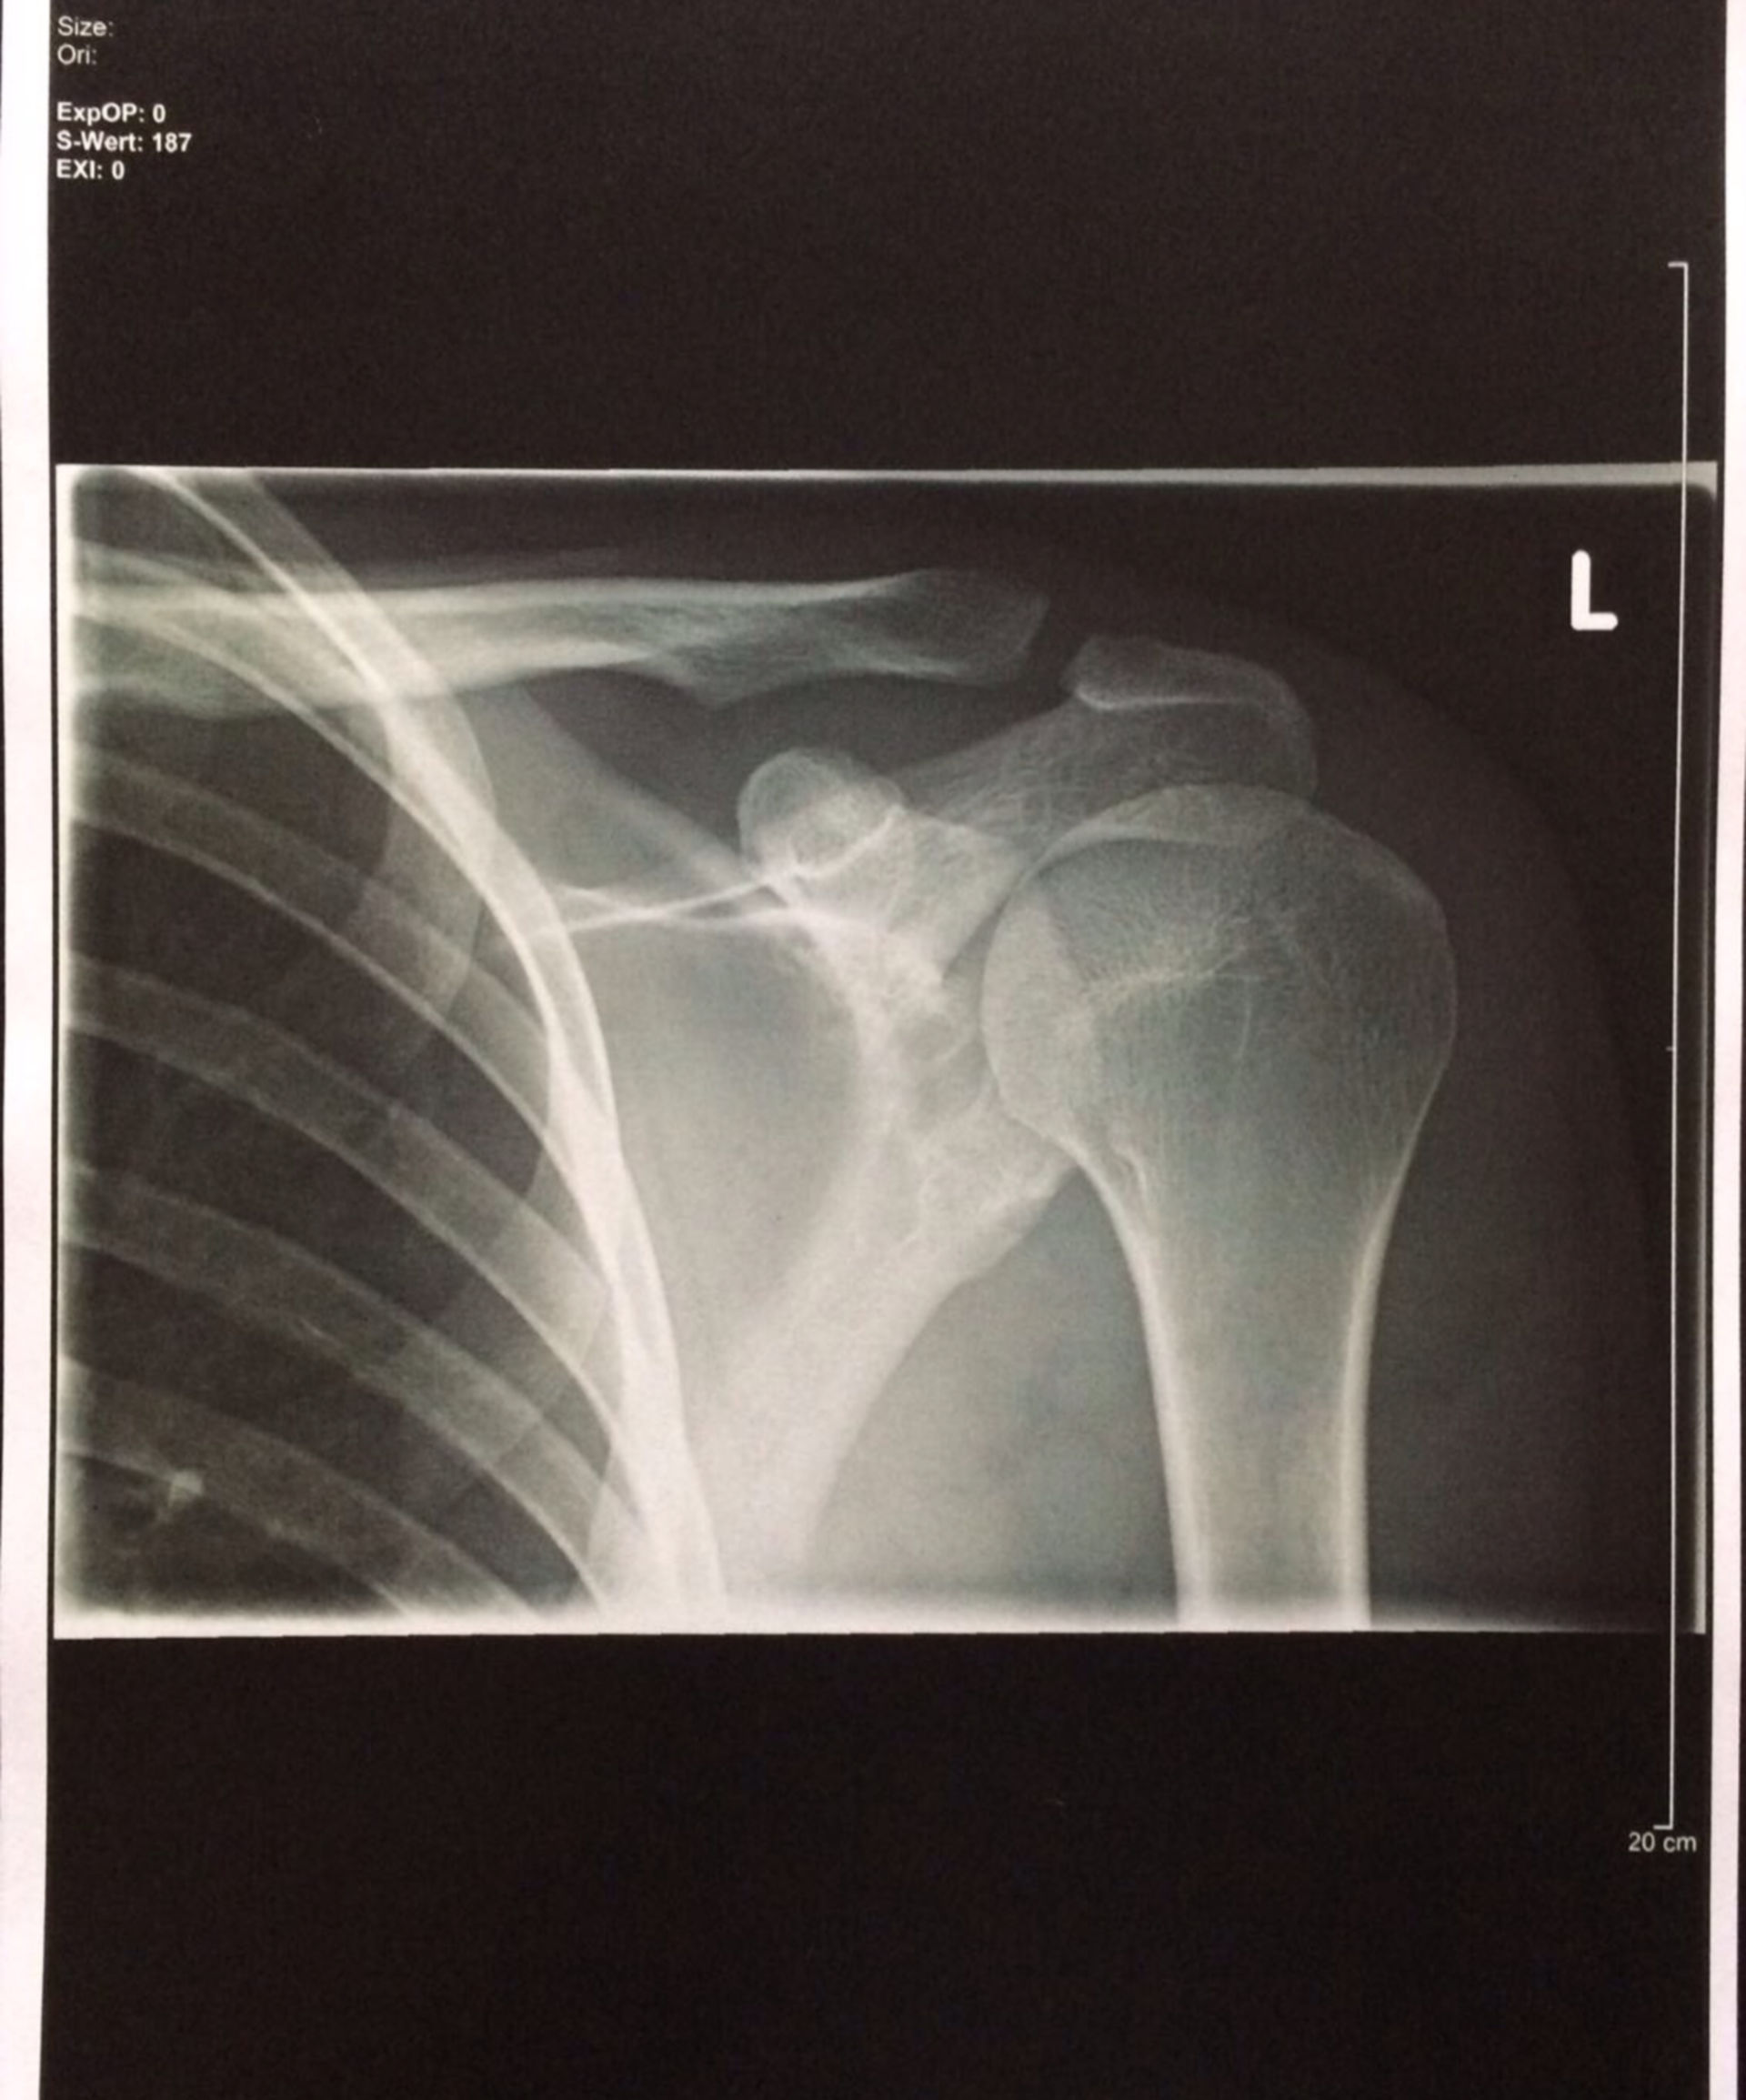 Röntgenbild Schlüsselbein